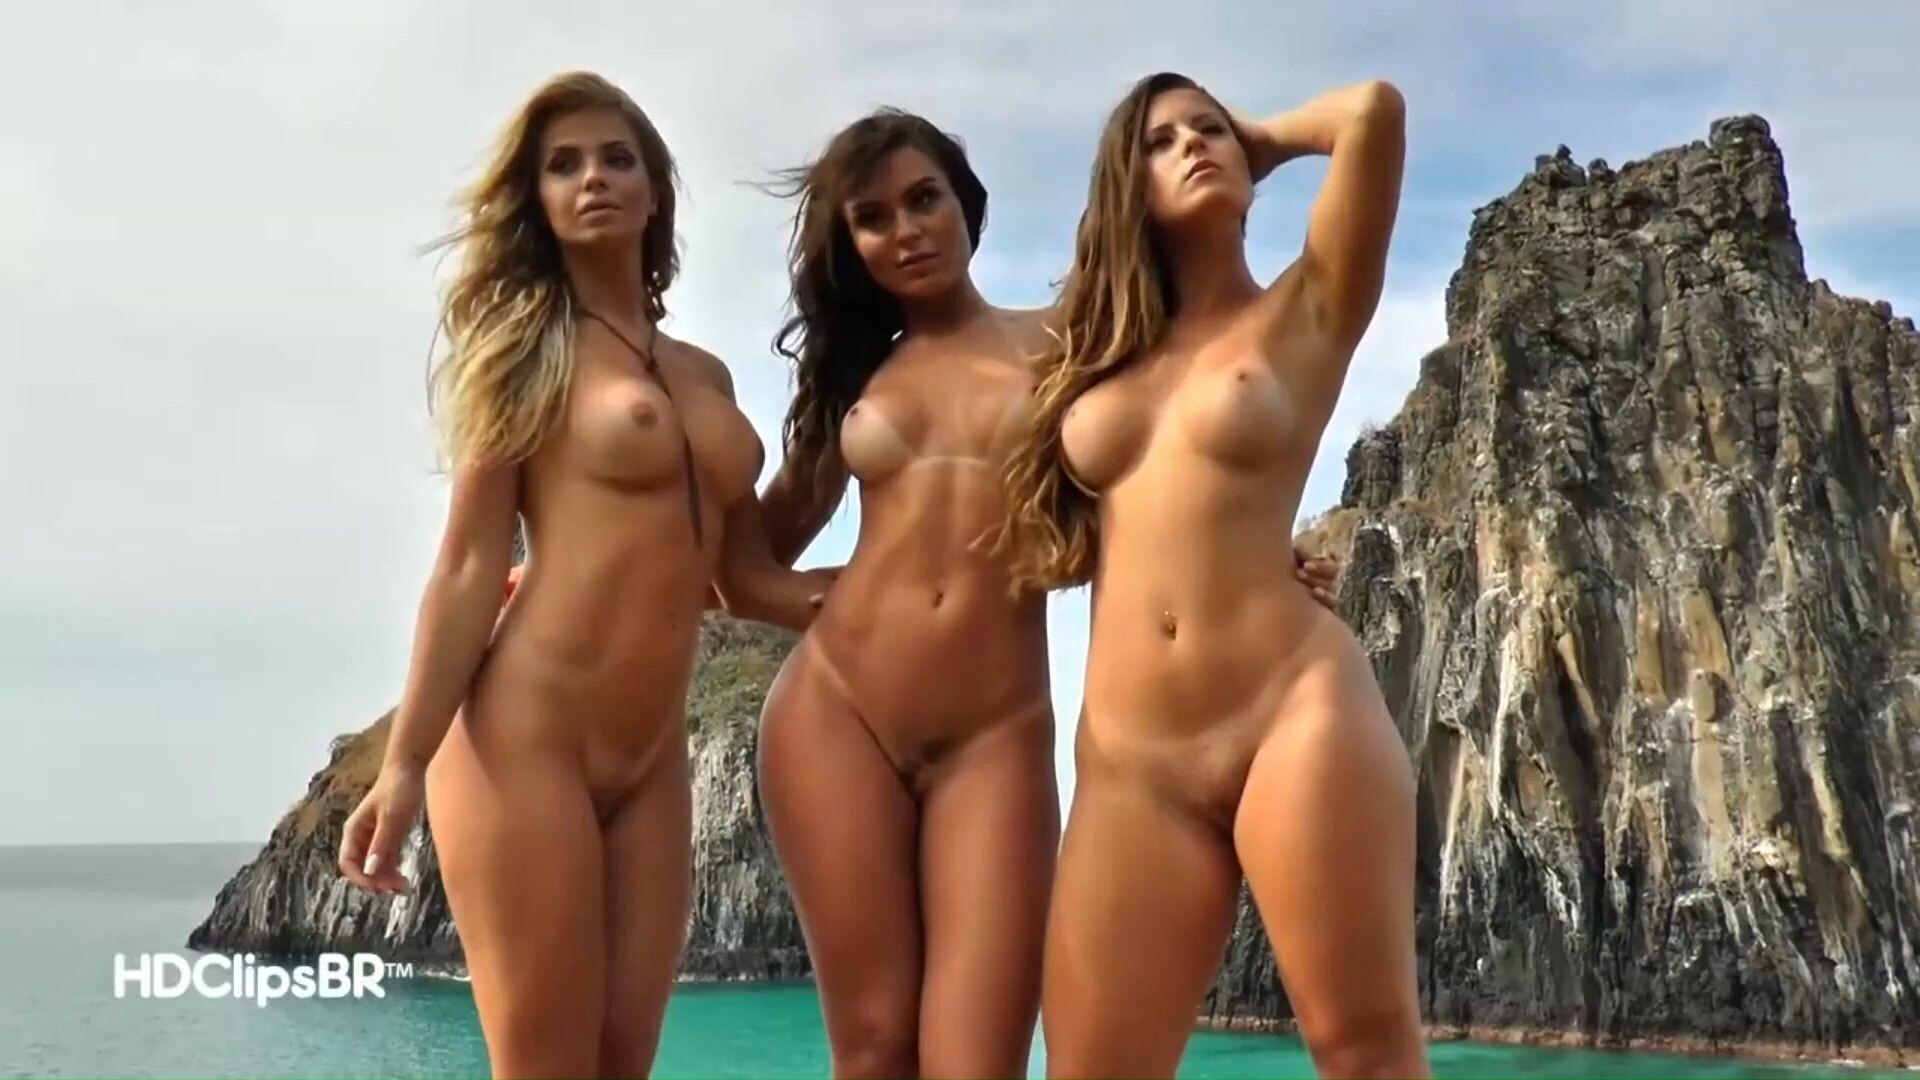 три голые девушки на фоне моря